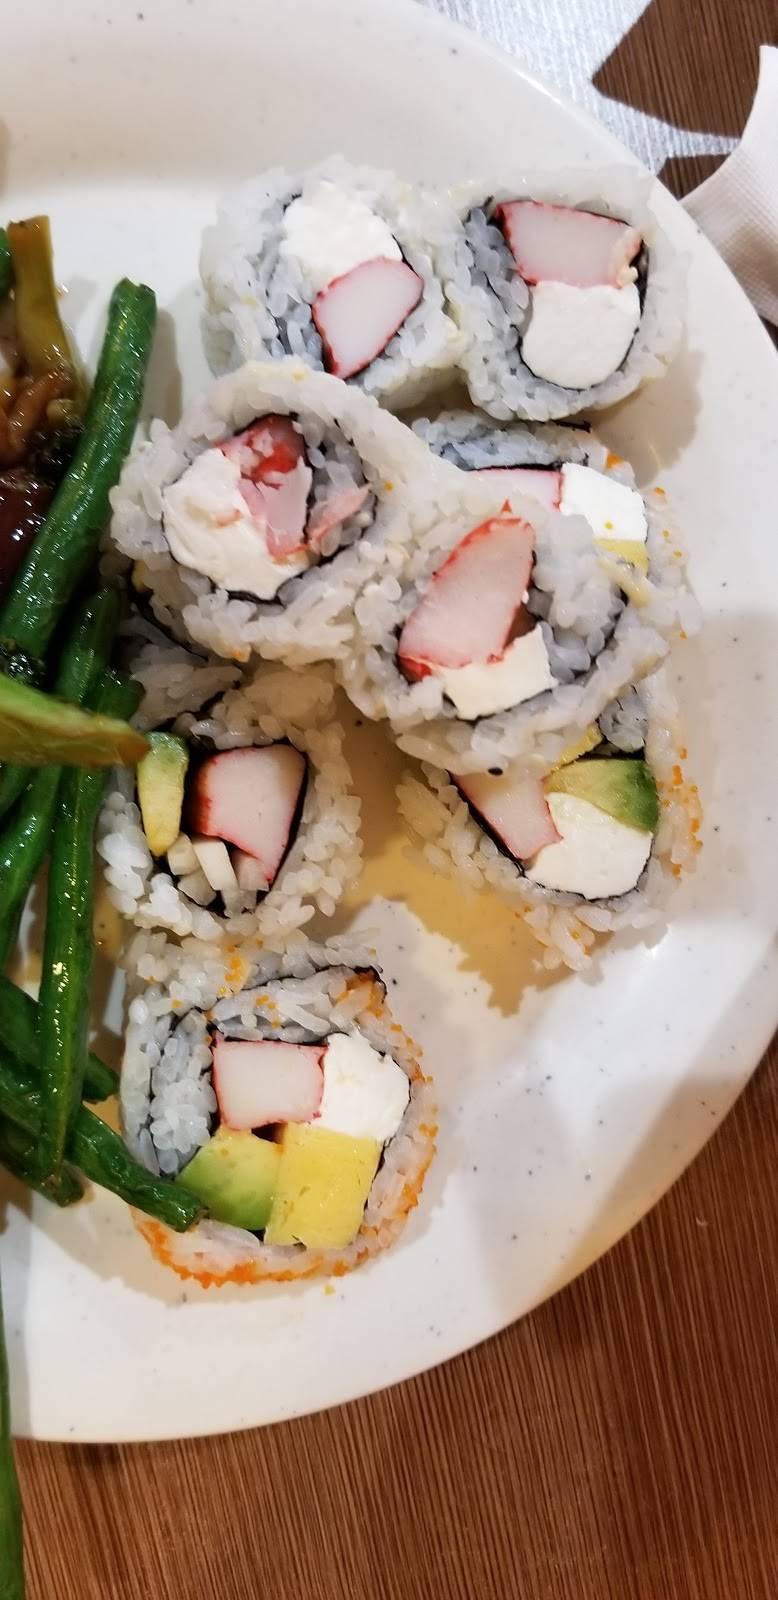 Grand Sushi Hibachi Buffet   restaurant   10421 US-19, Port Richey, FL 34668, USA   7278191866 OR +1 727-819-1866